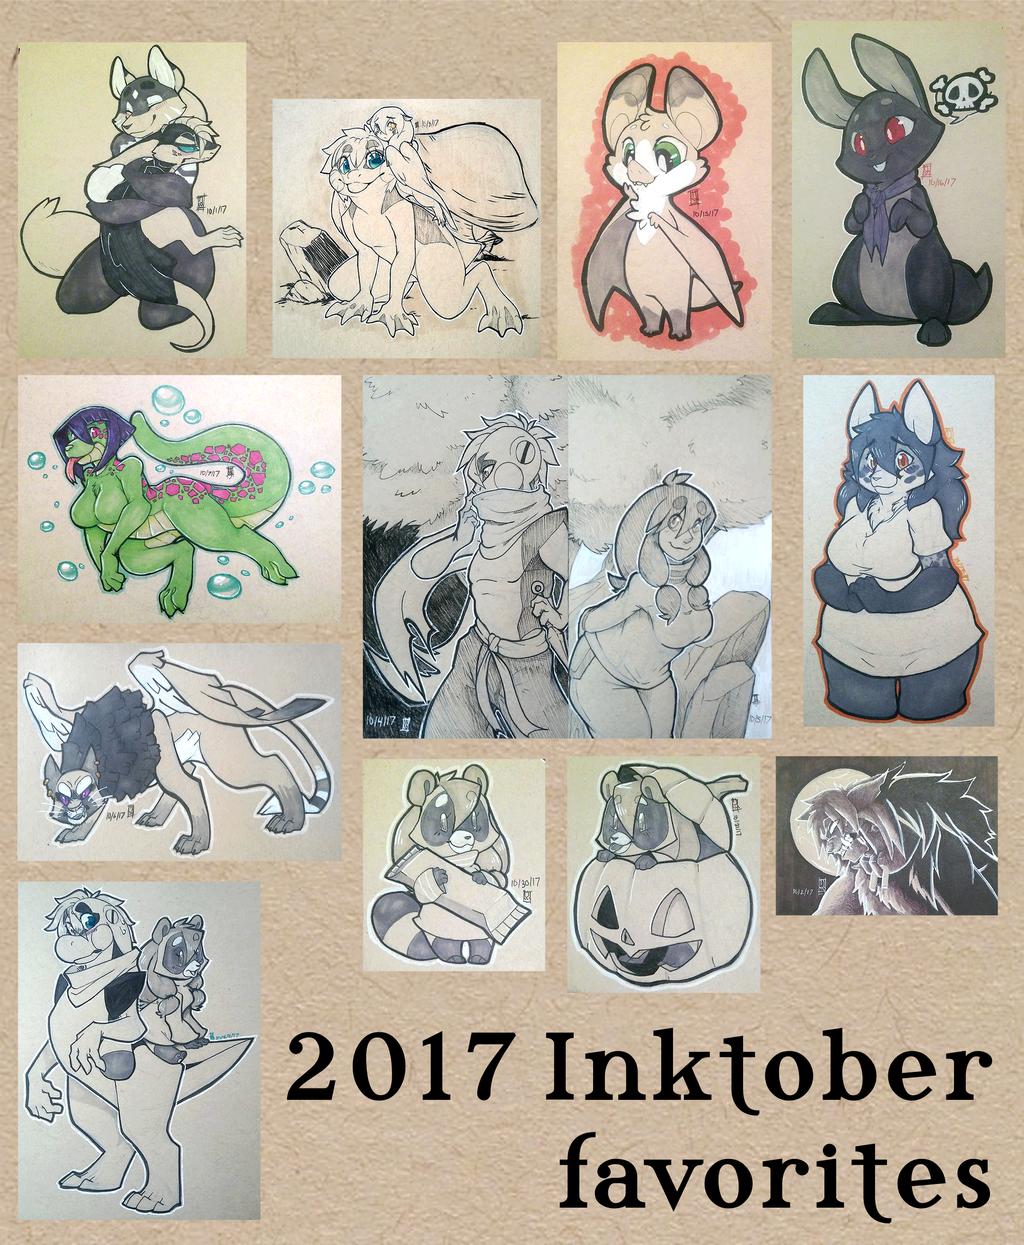 Inktober 2017 favorites